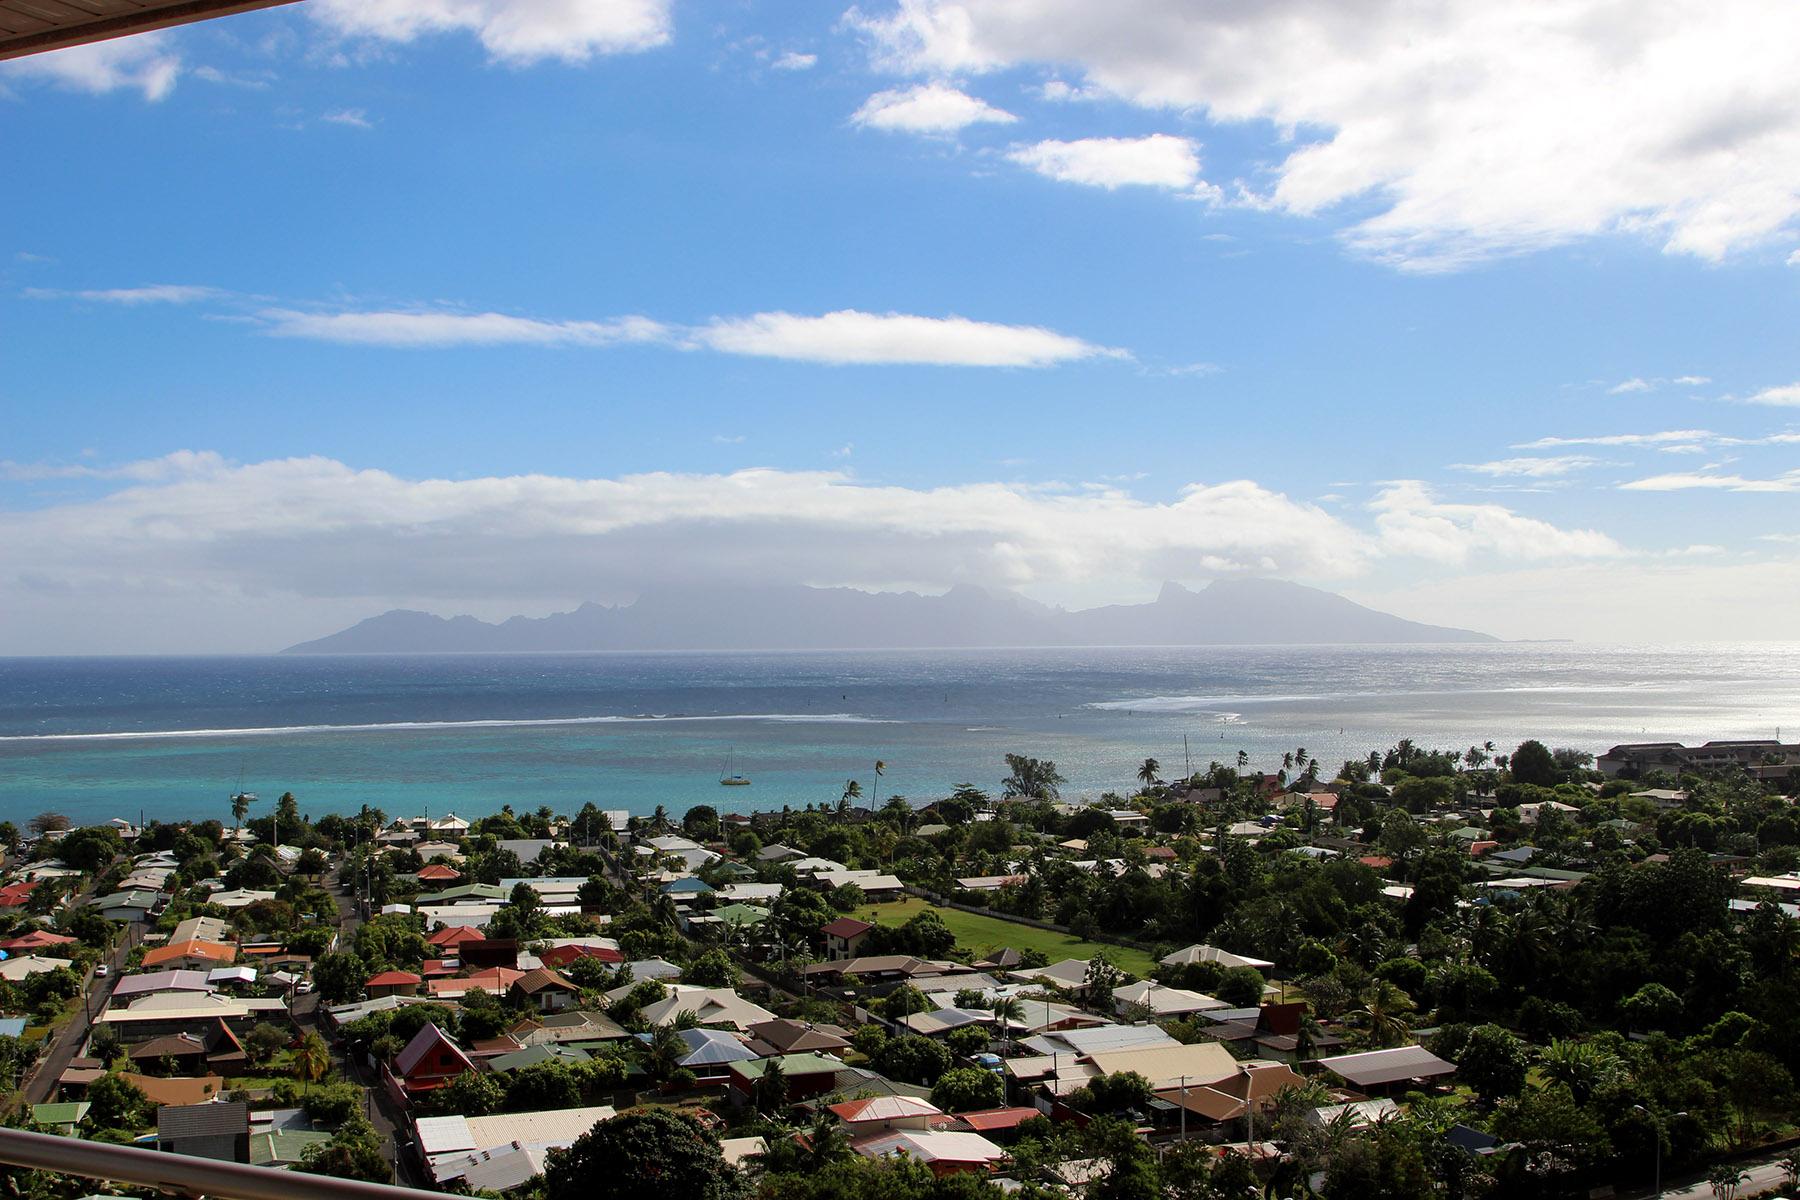 Casa Unifamiliar por un Venta en Penthouse with private swimming-pool and Jacuzzi framing Moorea Tahiti, French Polynesia